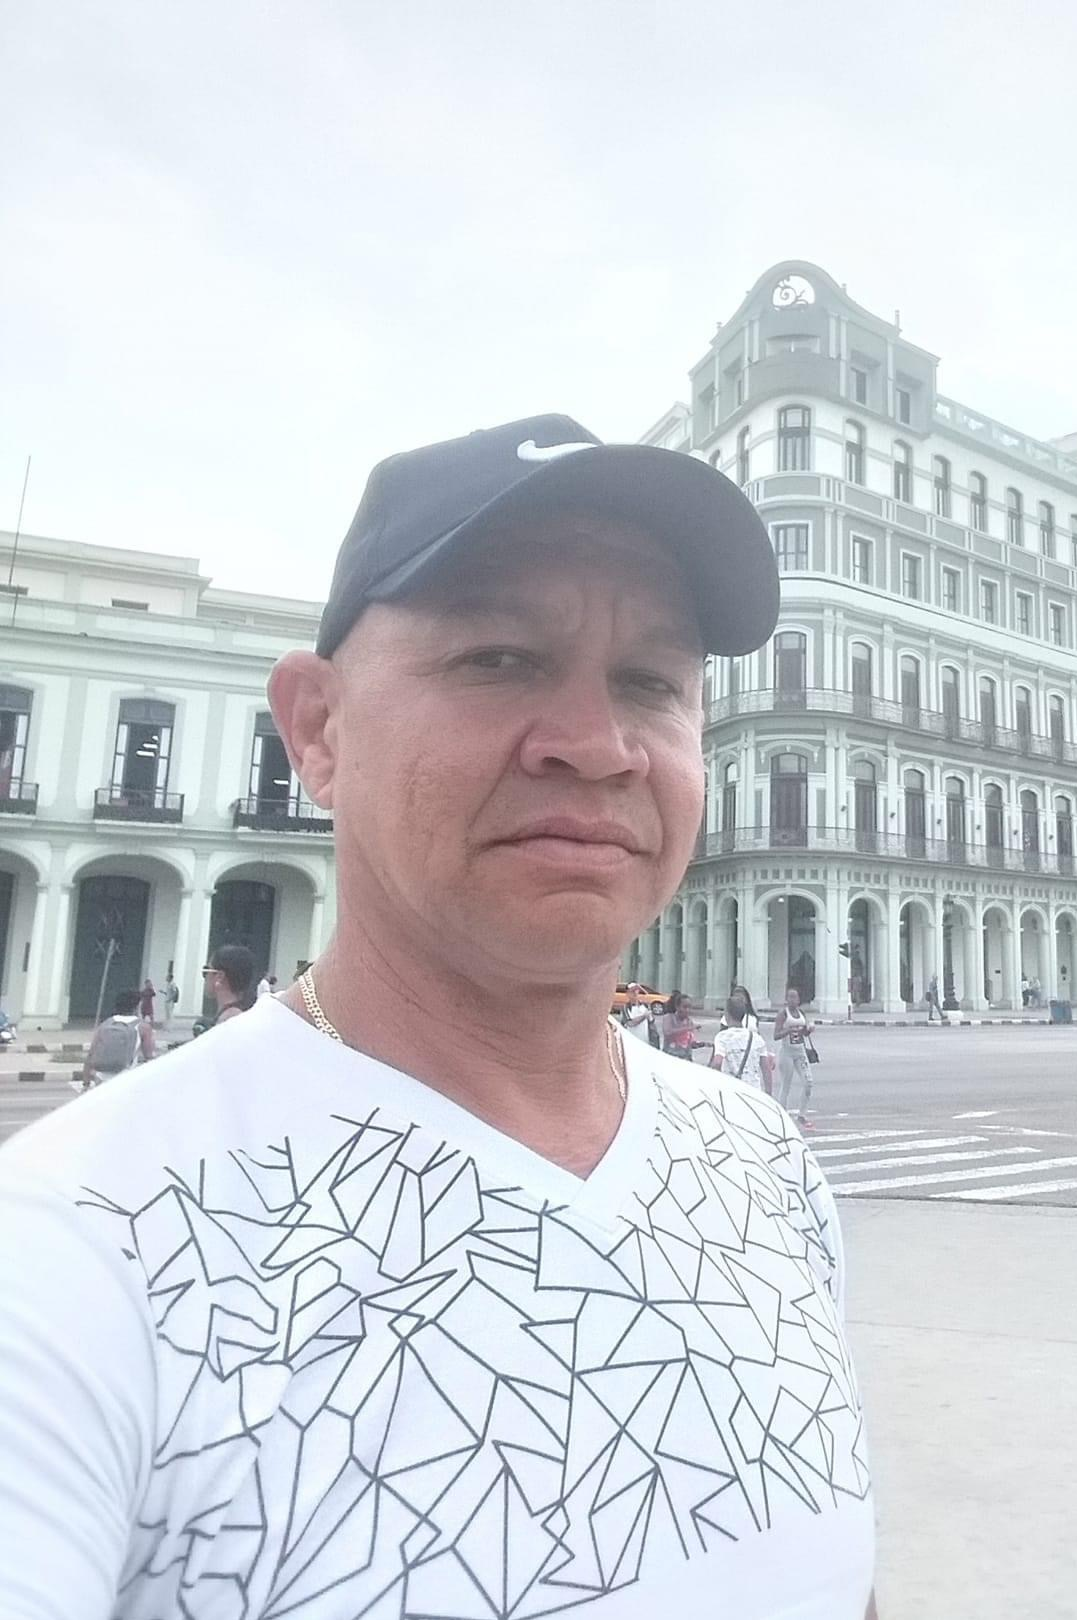 RAUDELIS RODRIGUEZ